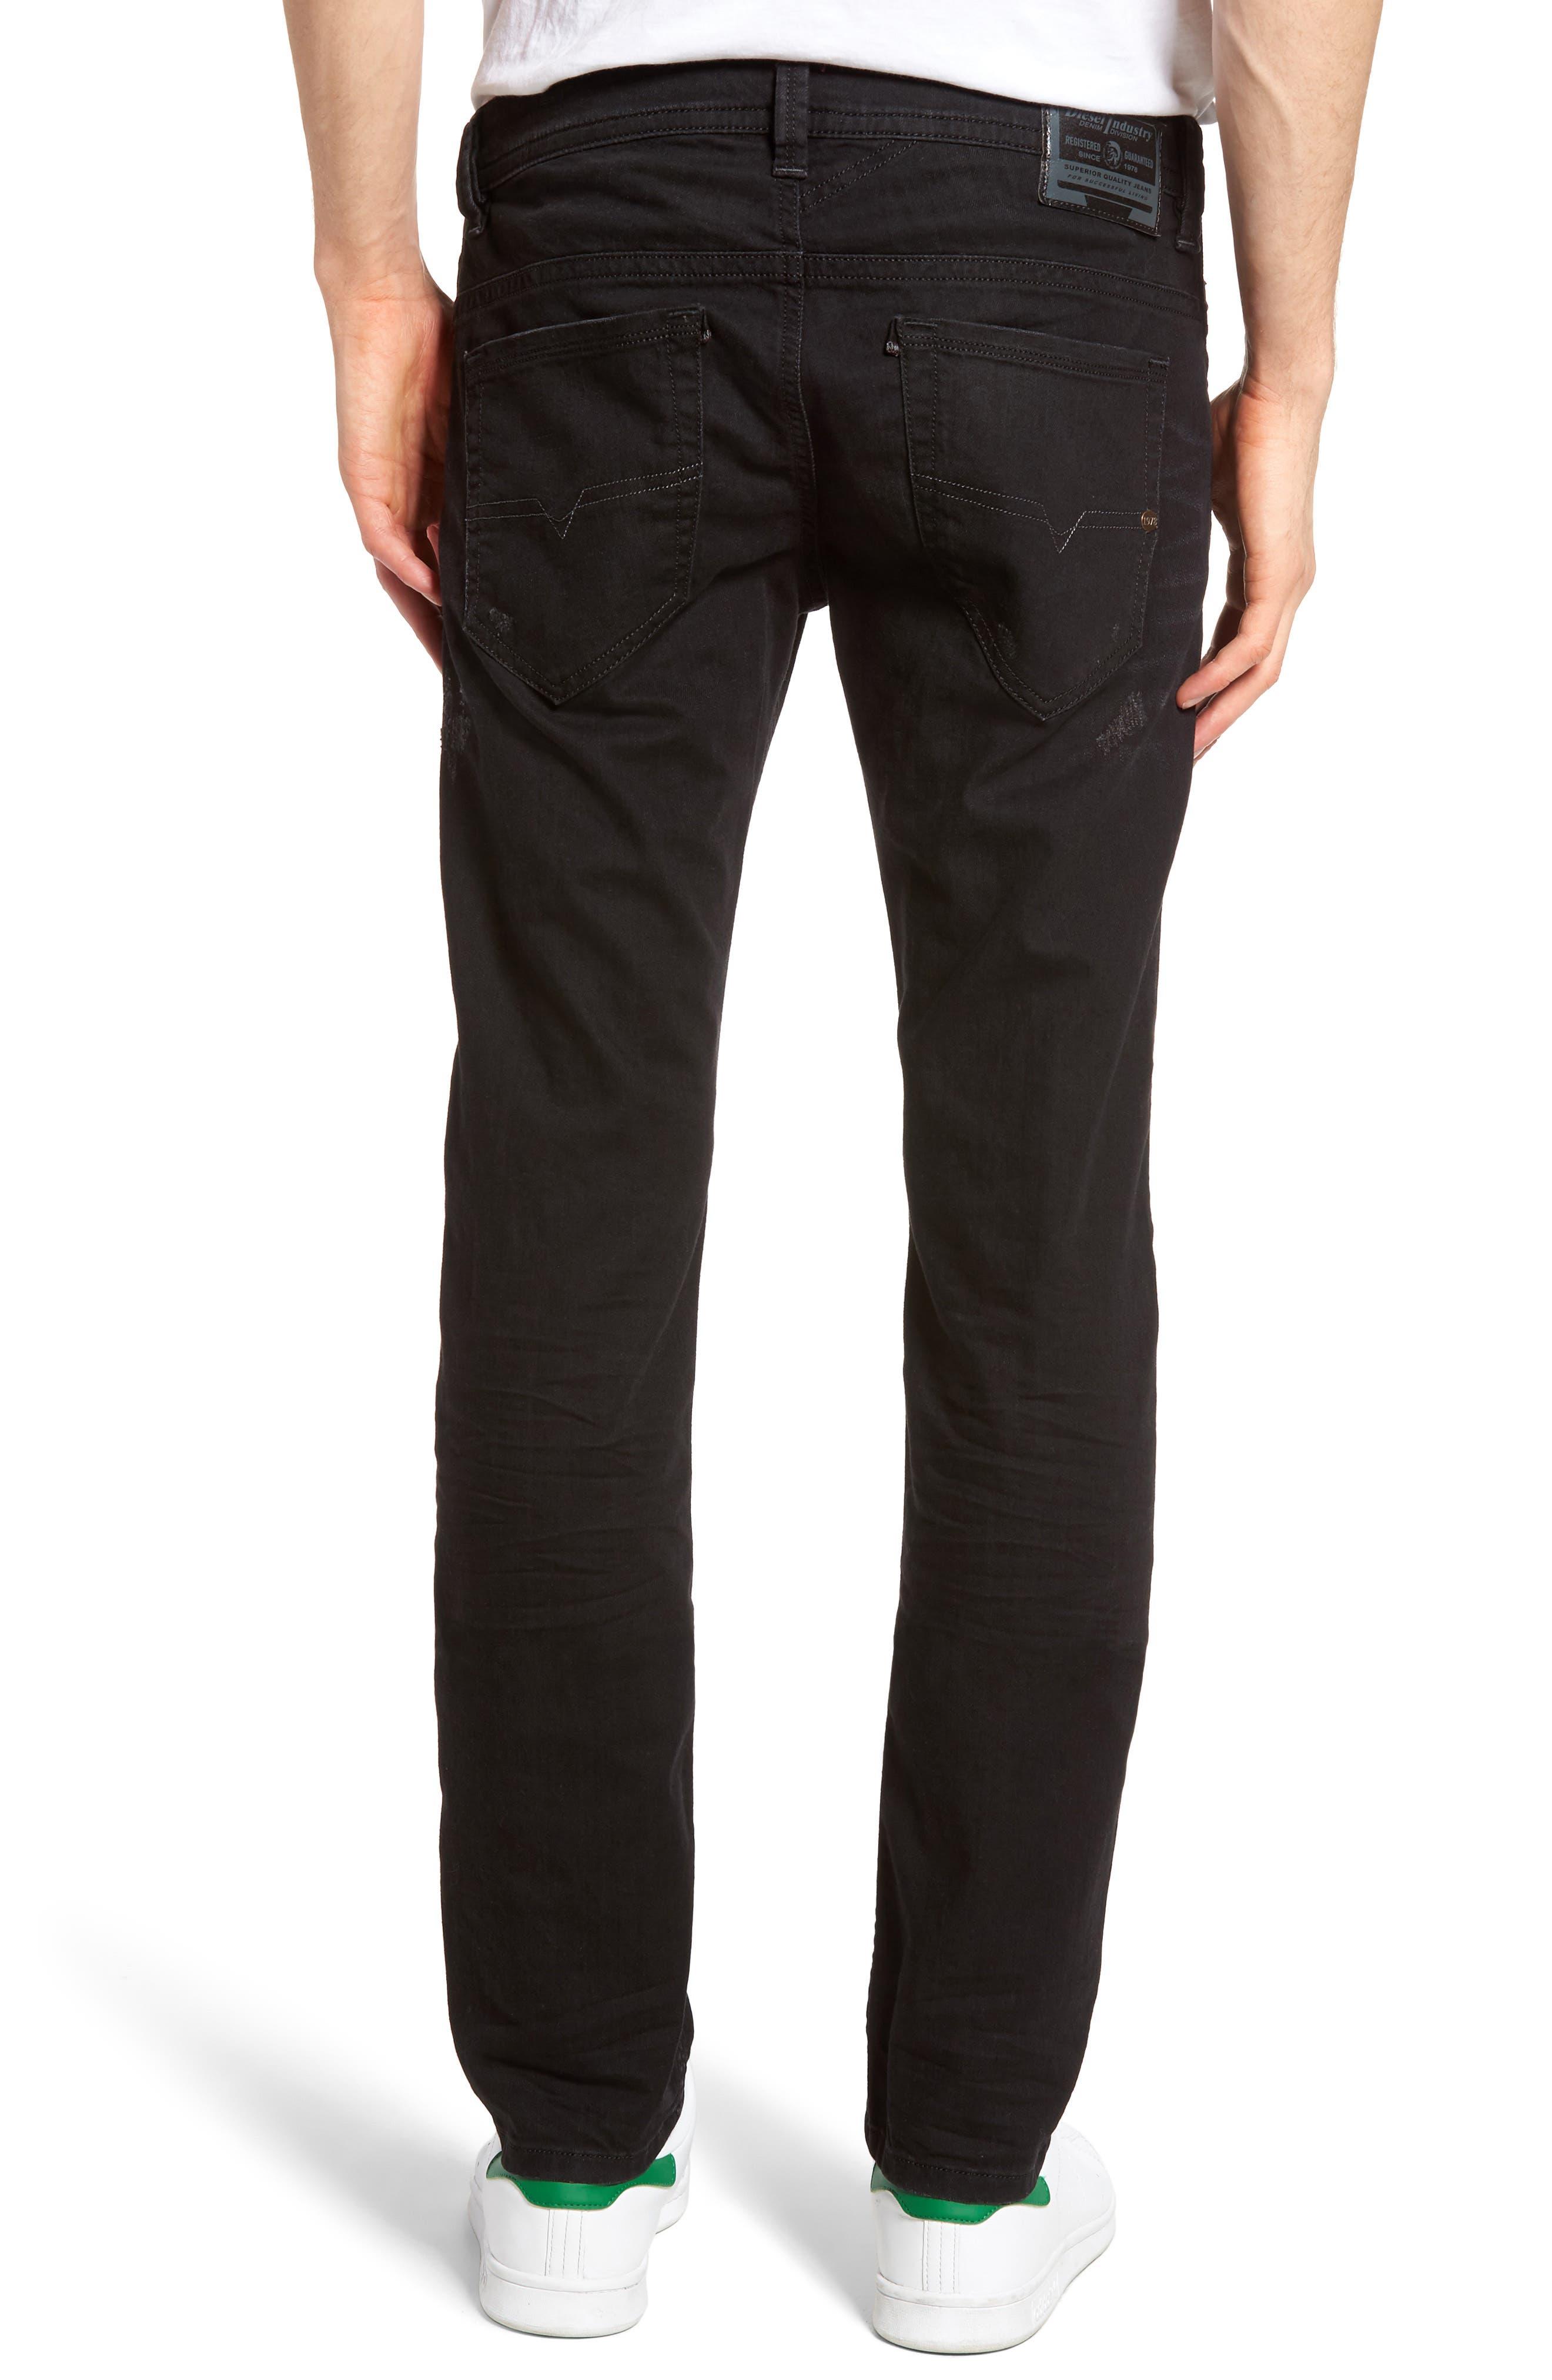 Thavar Skinny Fit Jeans,                             Alternate thumbnail 2, color,                             0679F